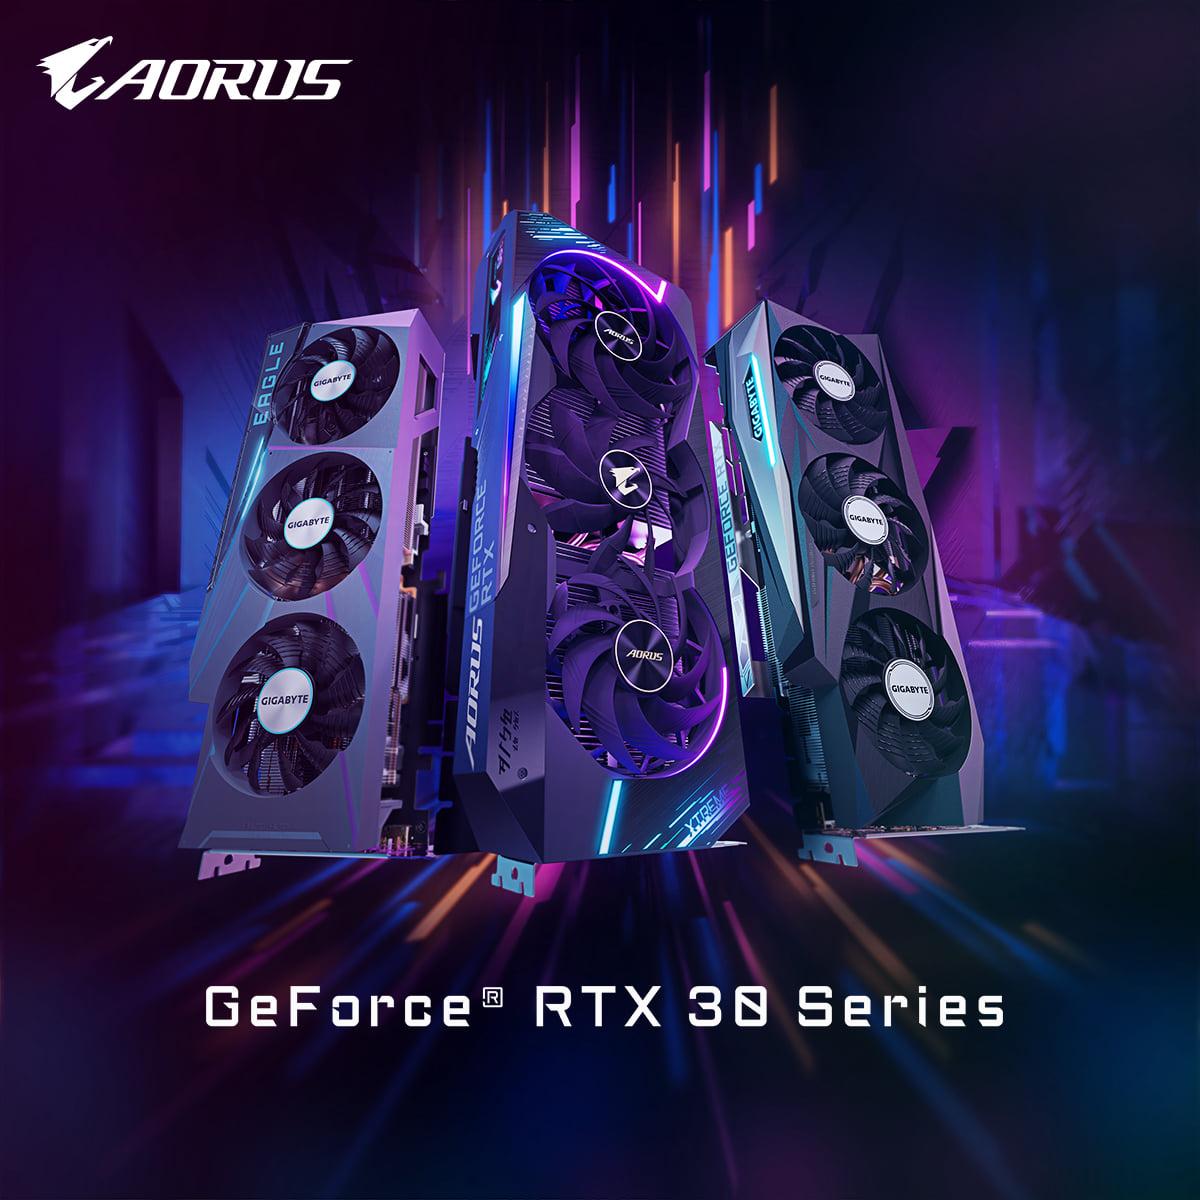 Gigabyte GeForce RTX 3080 Ti 20 GB & GeForce RTX 3060 12 GB Graphics Cards Bocor Melalui EEC